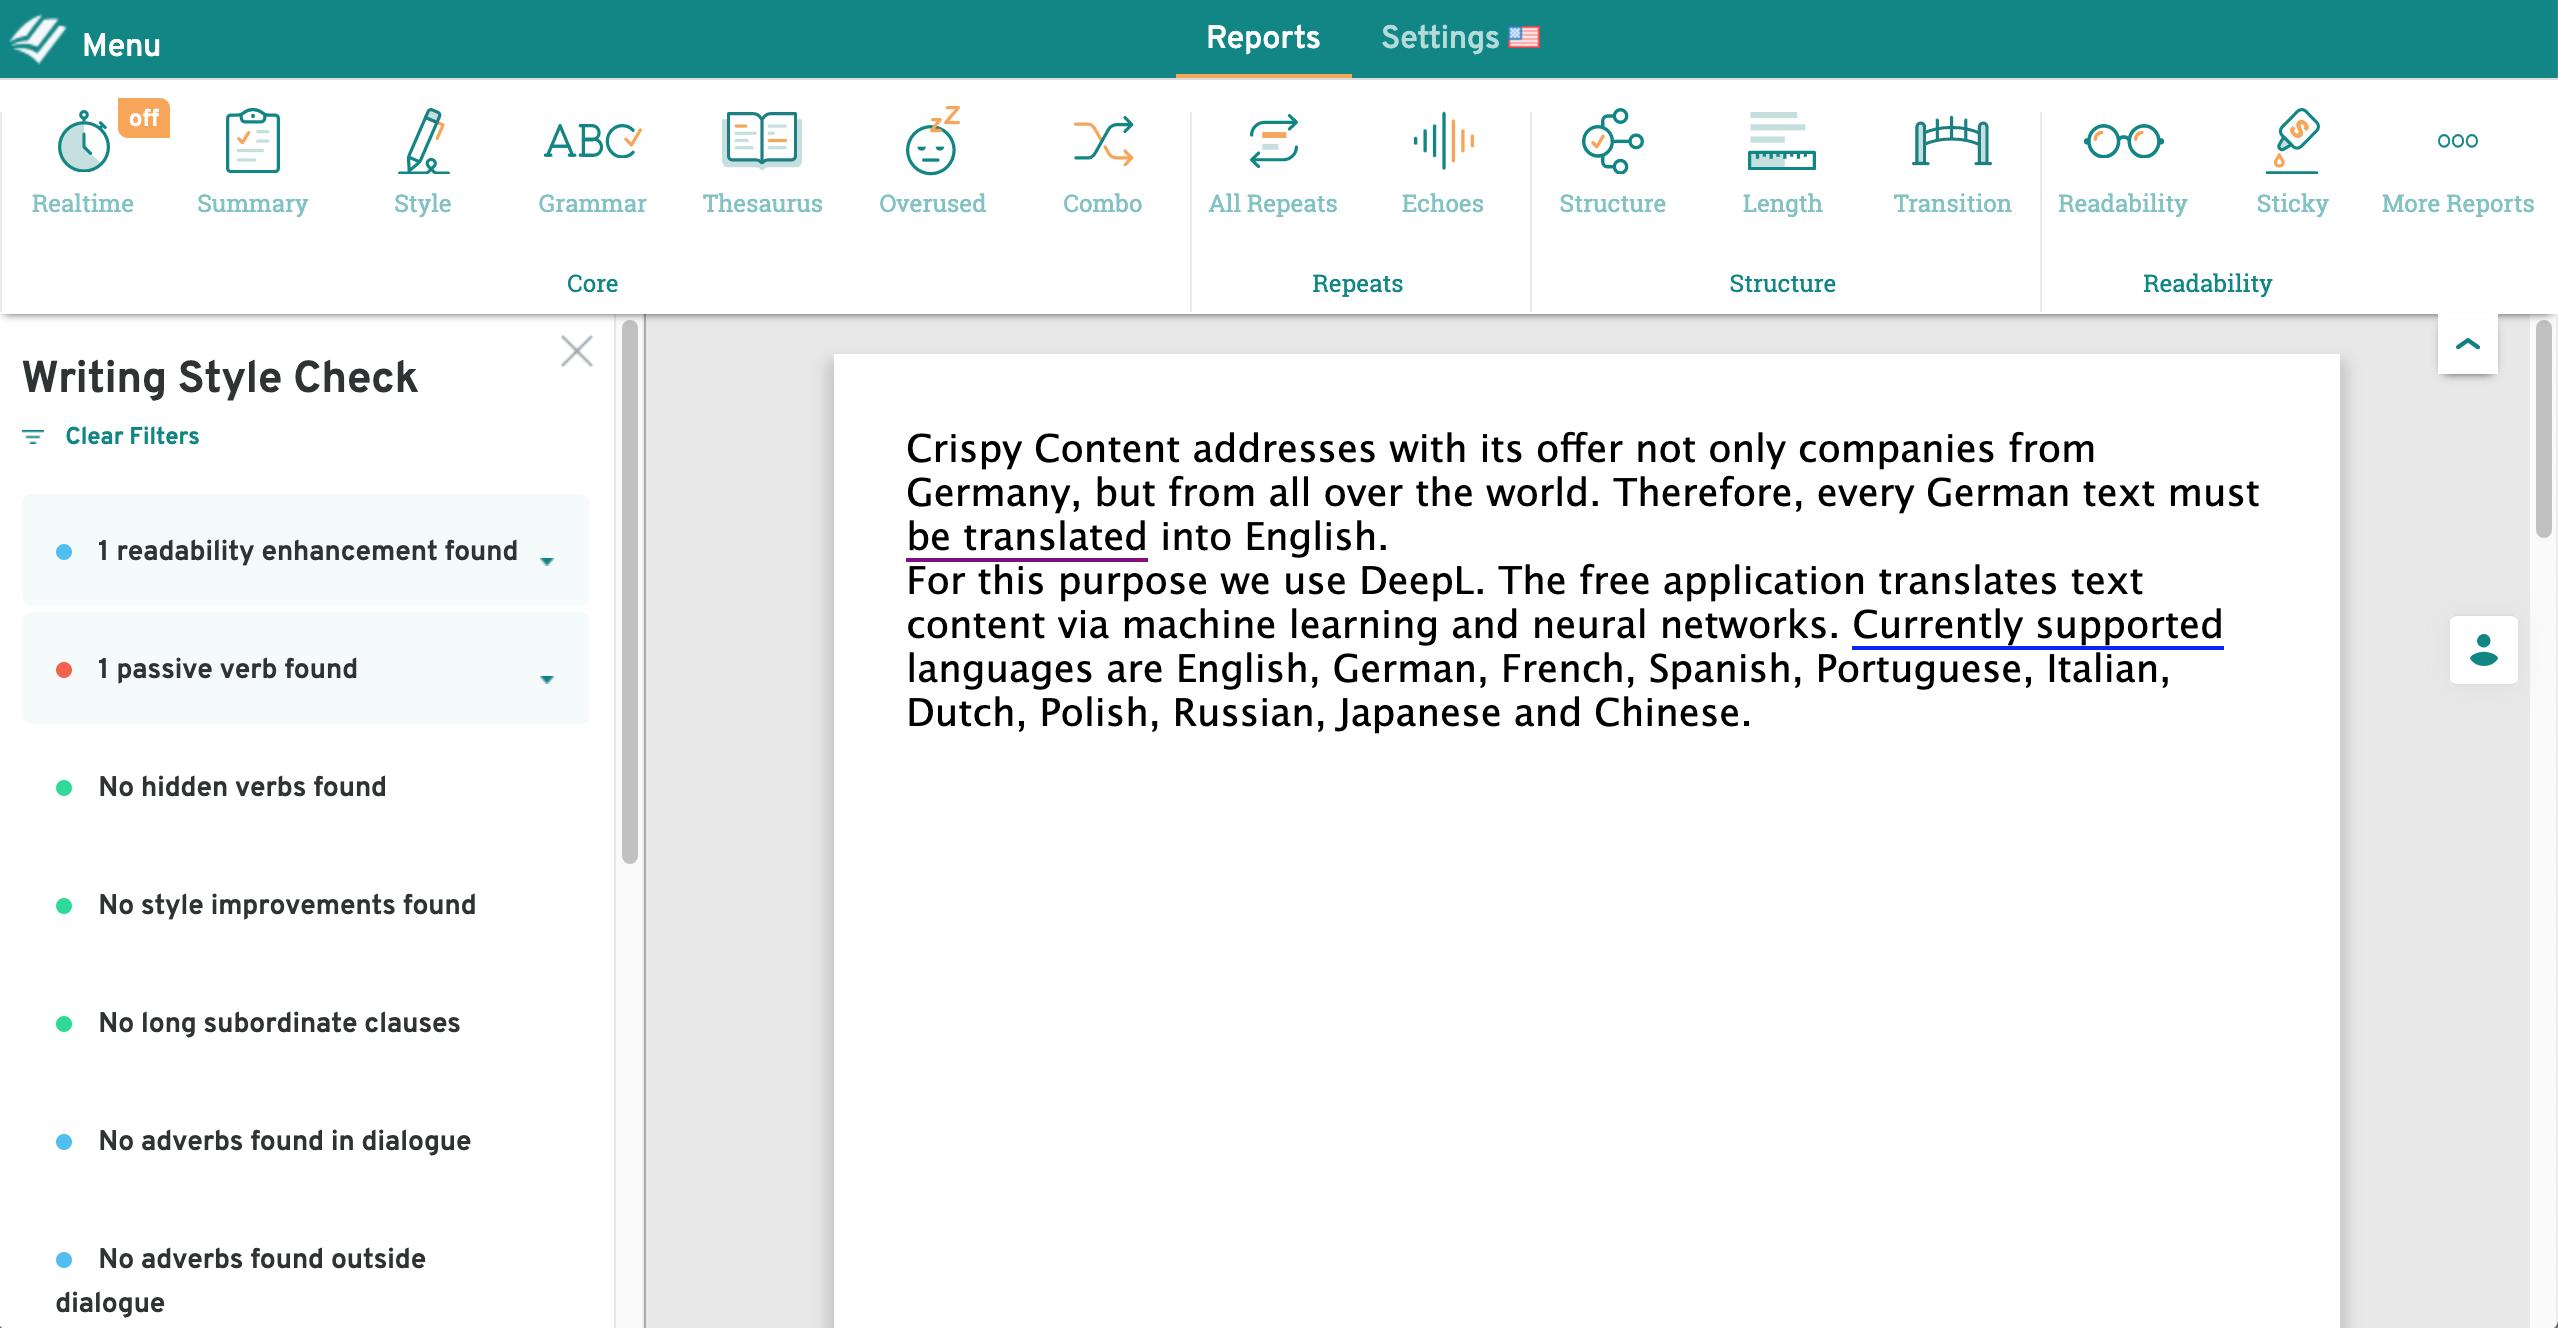 Content Marketing Tools Essentials, ProWritingAid, Crispy Content®